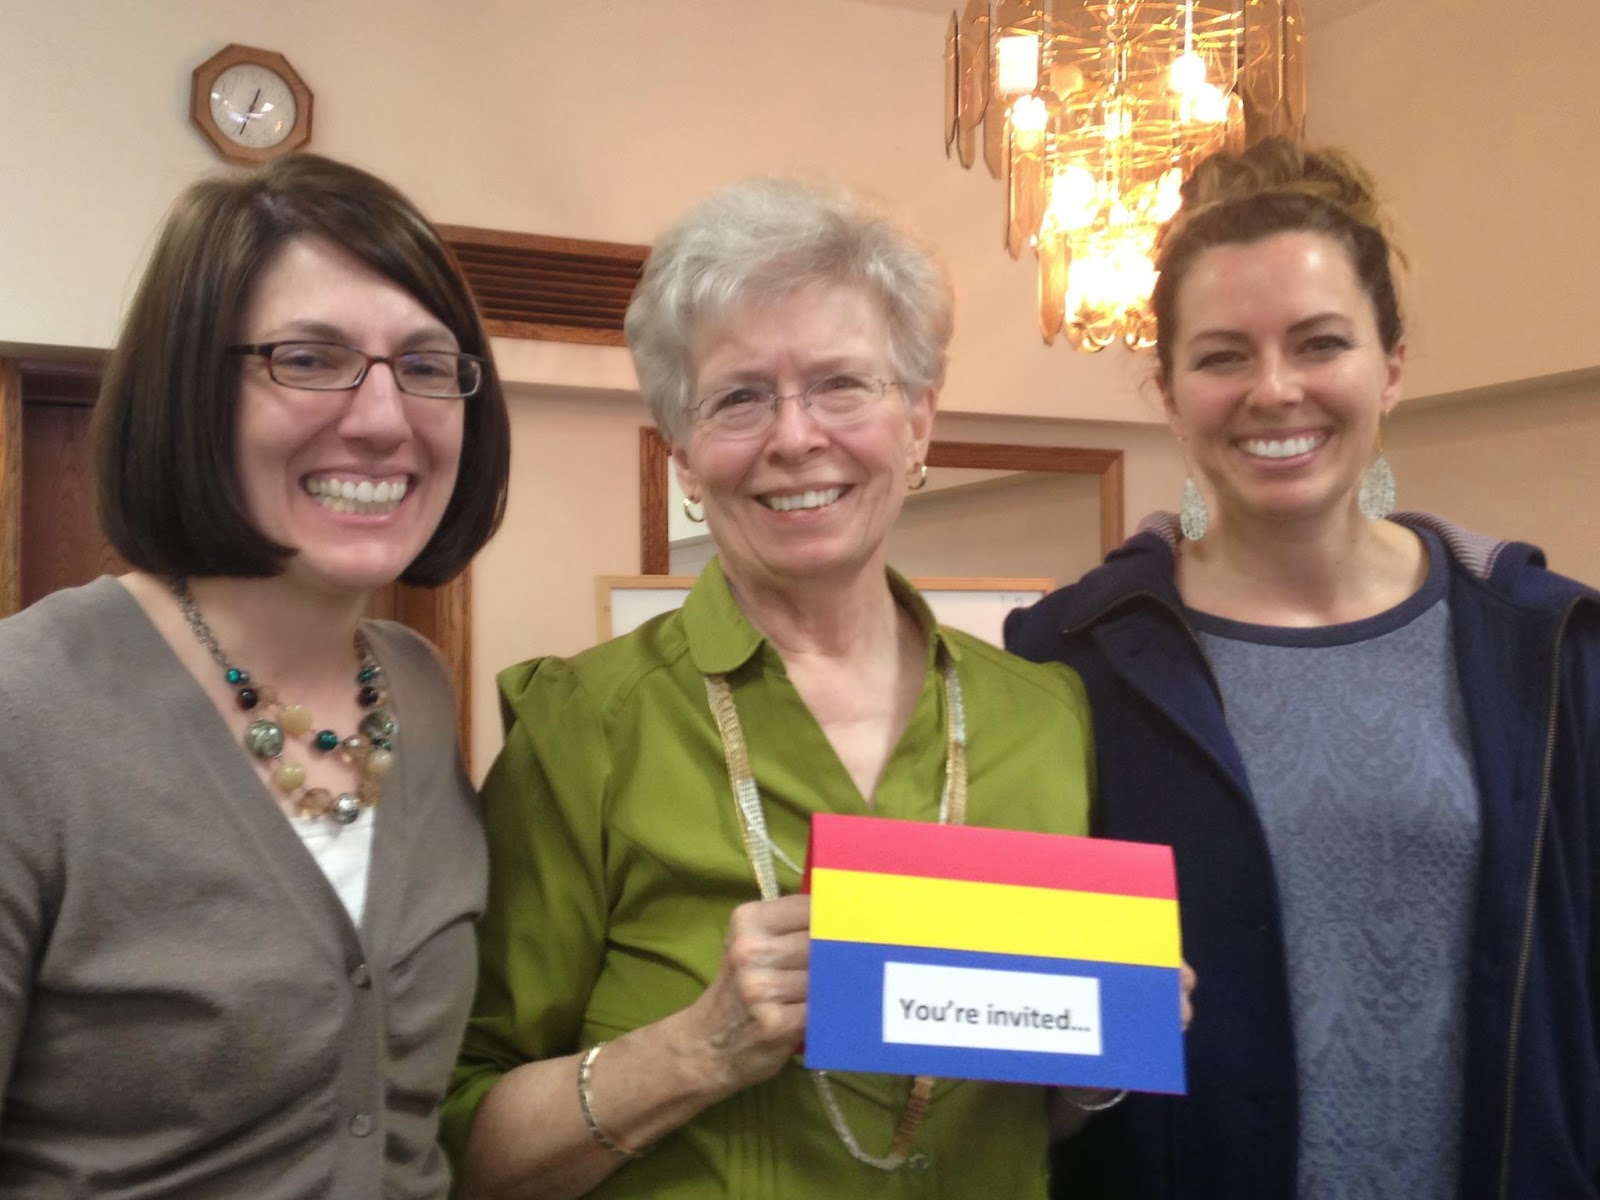 Camille's Primary Ideas: Pat Graham Workshop